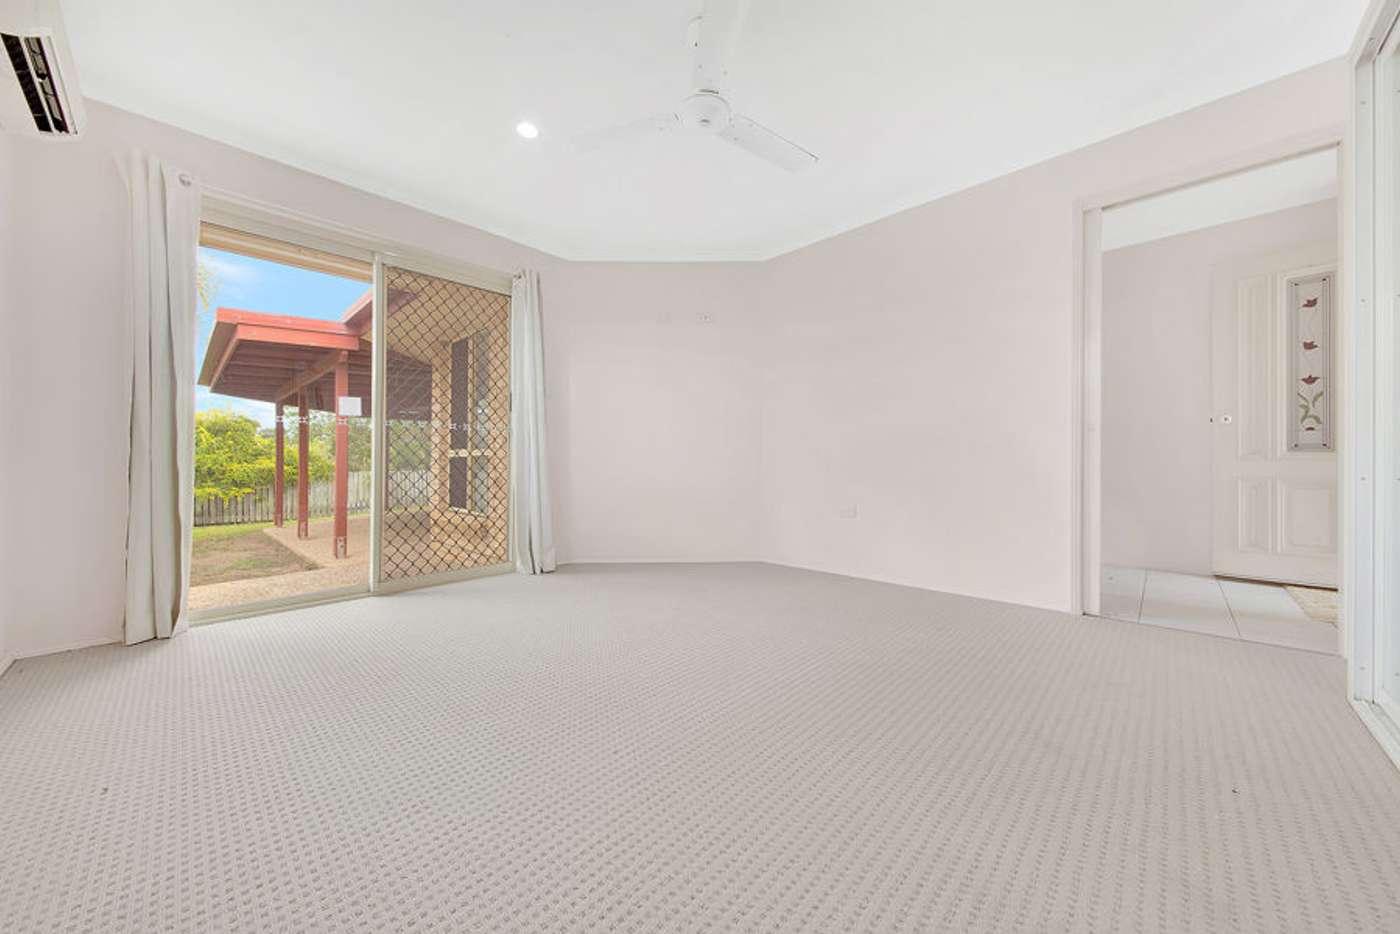 Sixth view of Homely house listing, 32 Brin Street, Boyne Island QLD 4680